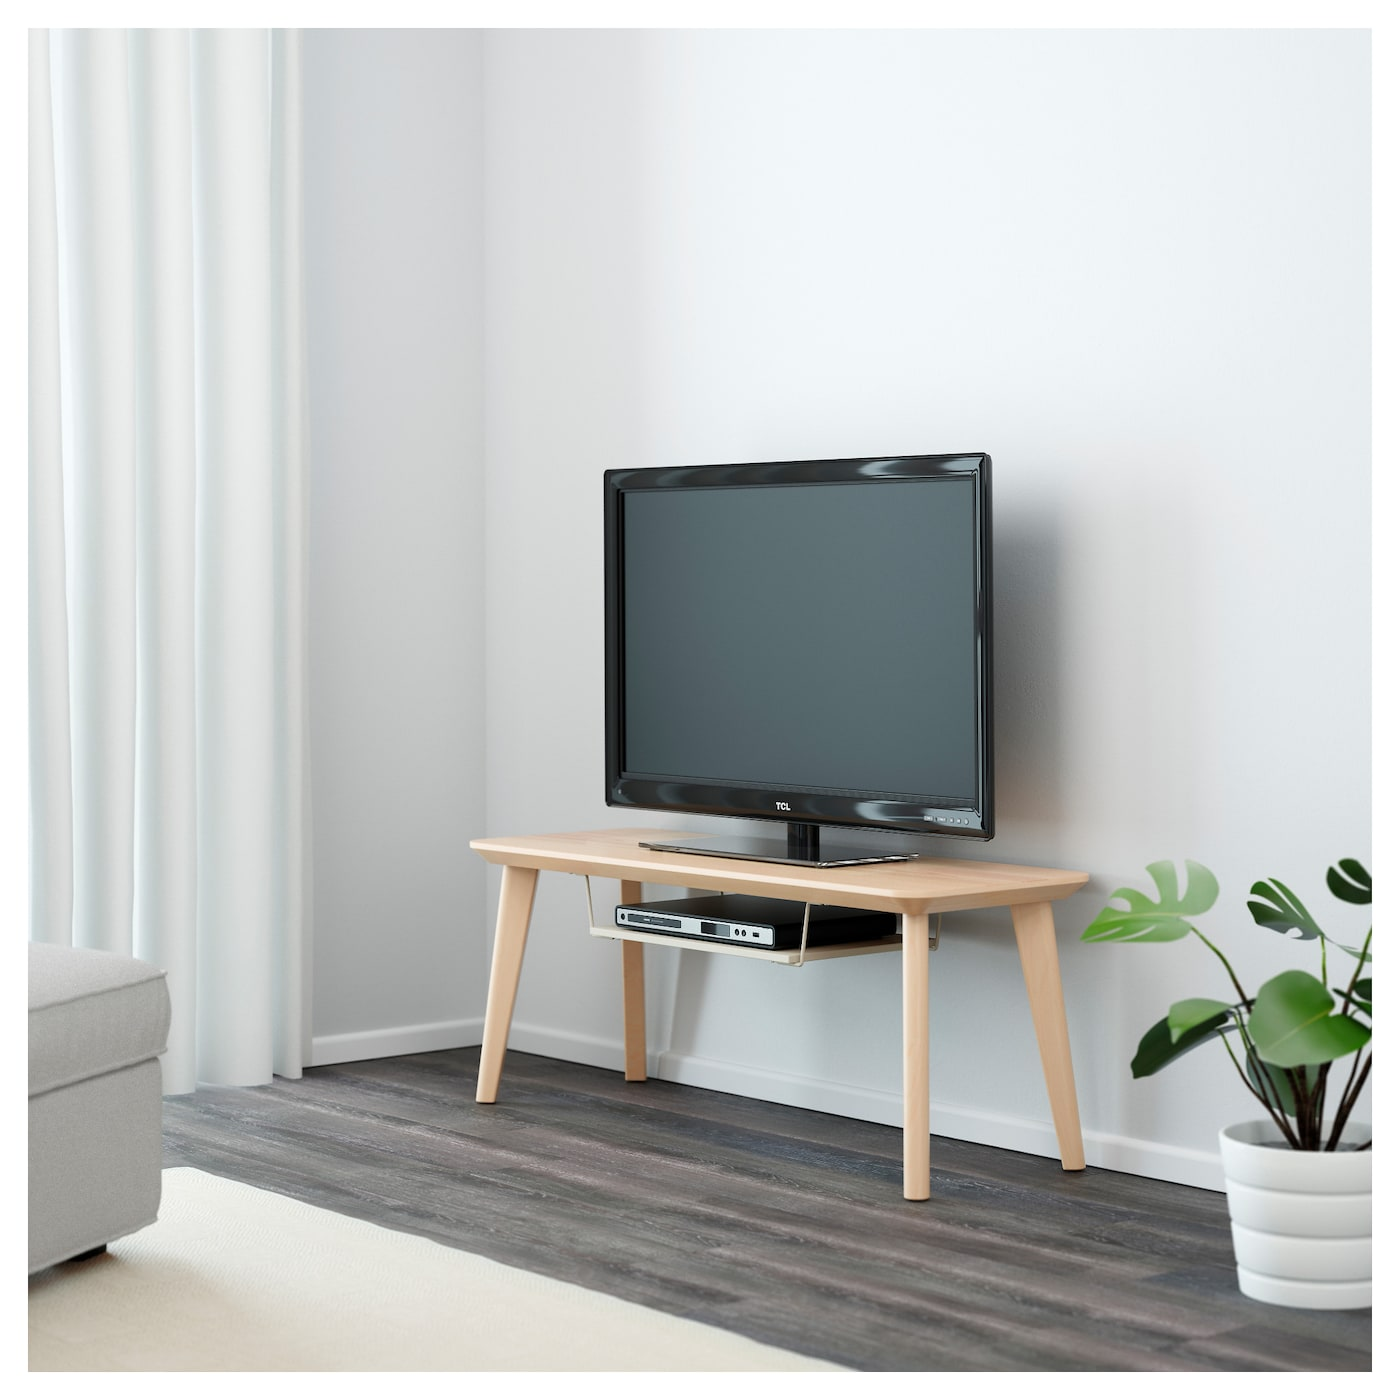 lisabo banc tv plaqué frêne 114 x 40 x 45 cm - ikea